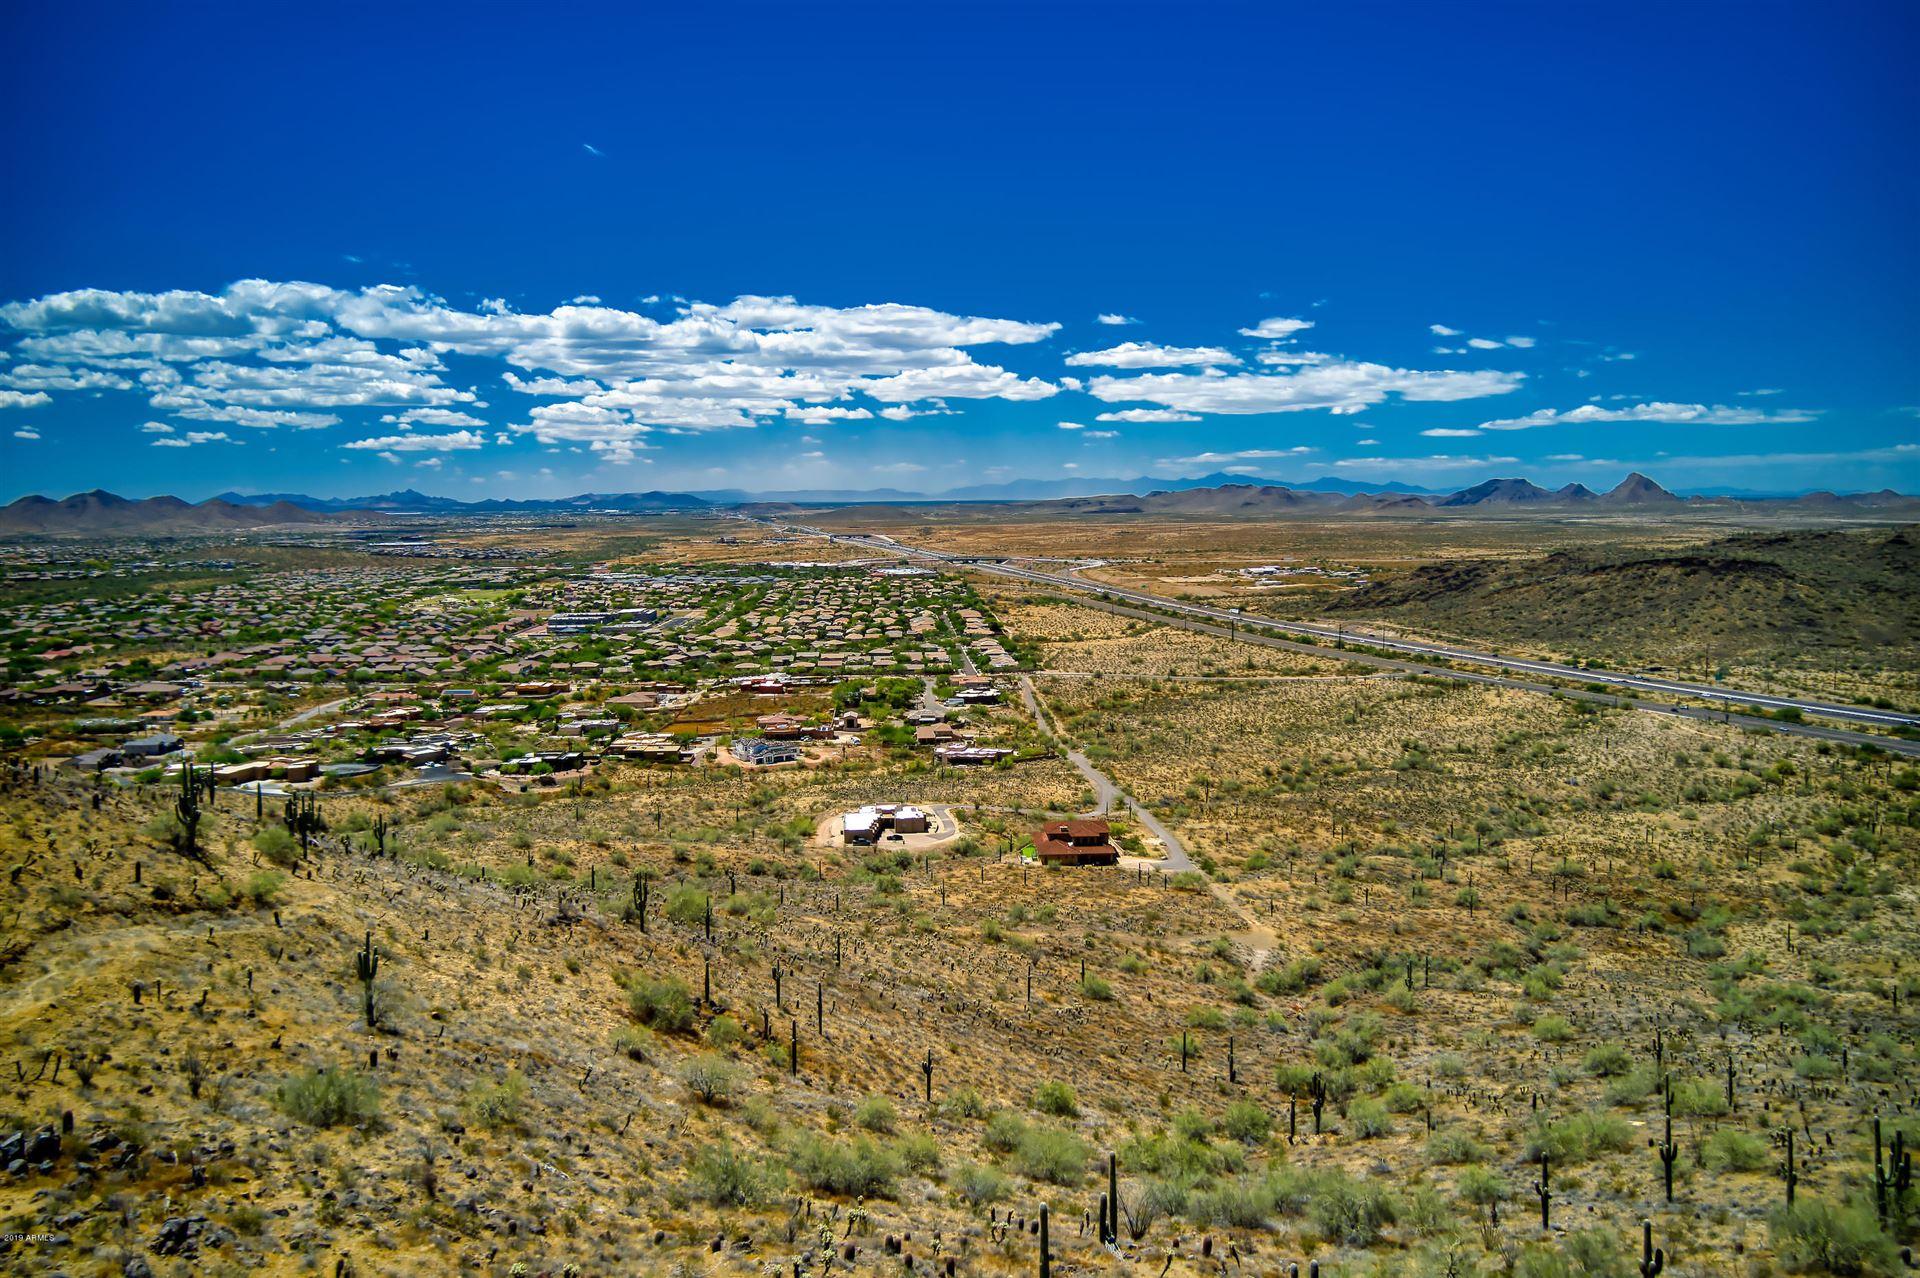 Photo of 3413 W Rambling Road W, Desert Hills, AZ 85086 (MLS # 5318863)